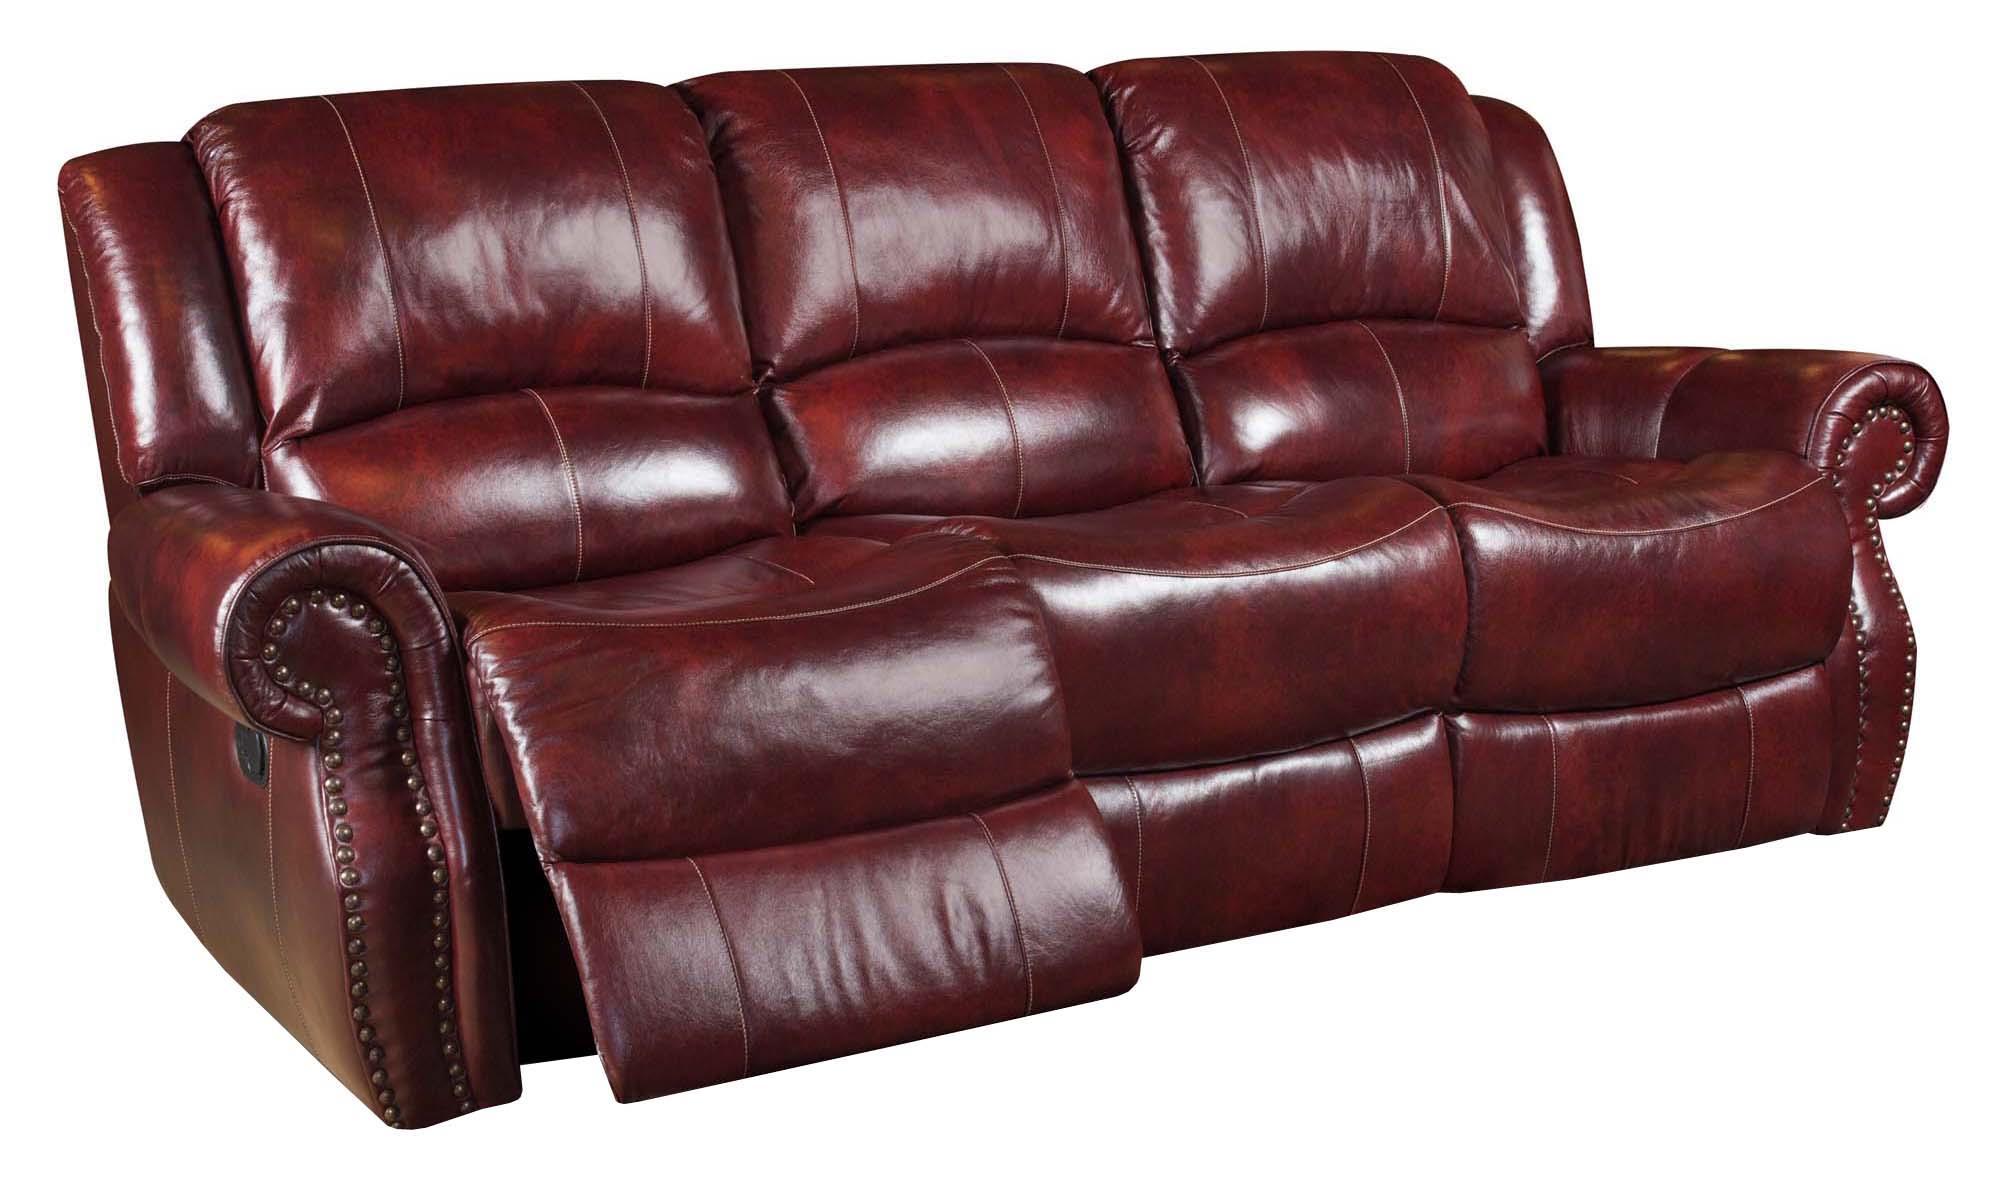 Corinthian Alexander 99901 30 Alexander Leather Reclining Sofa Great American Home Store